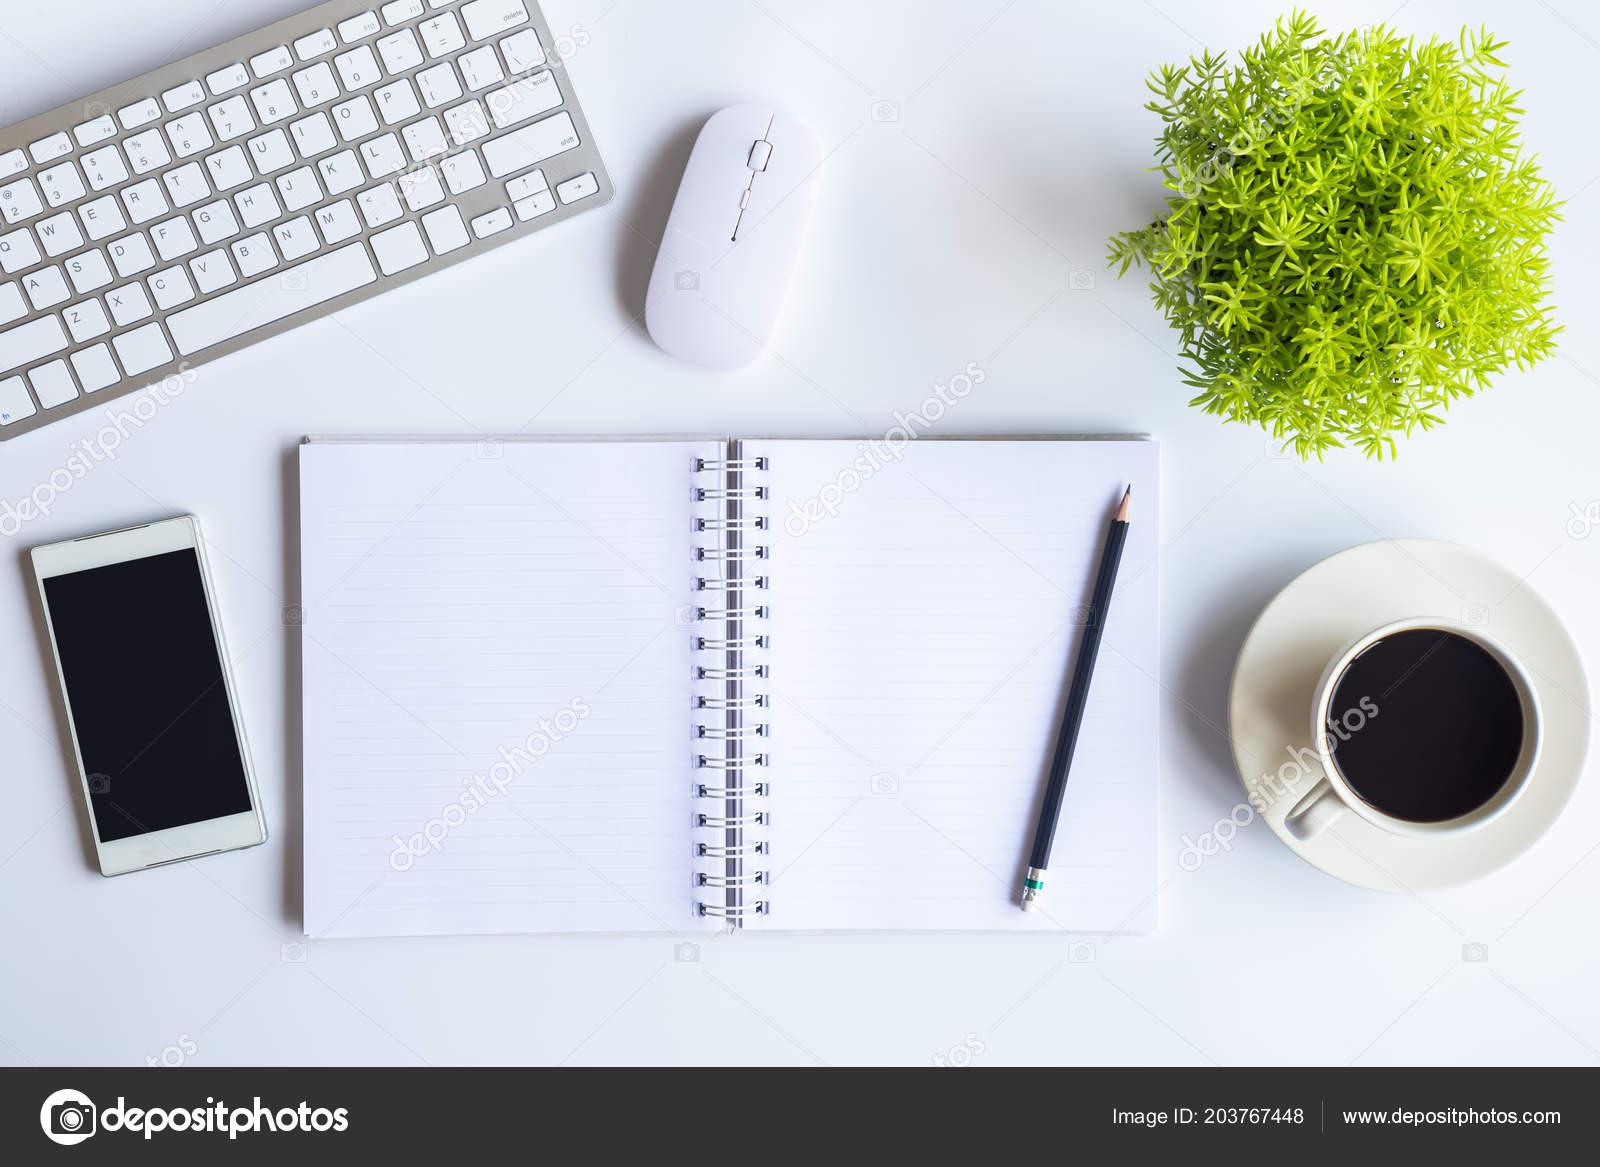 https depositphotos com 203767448 stock photo white desk office laptop smartphone html